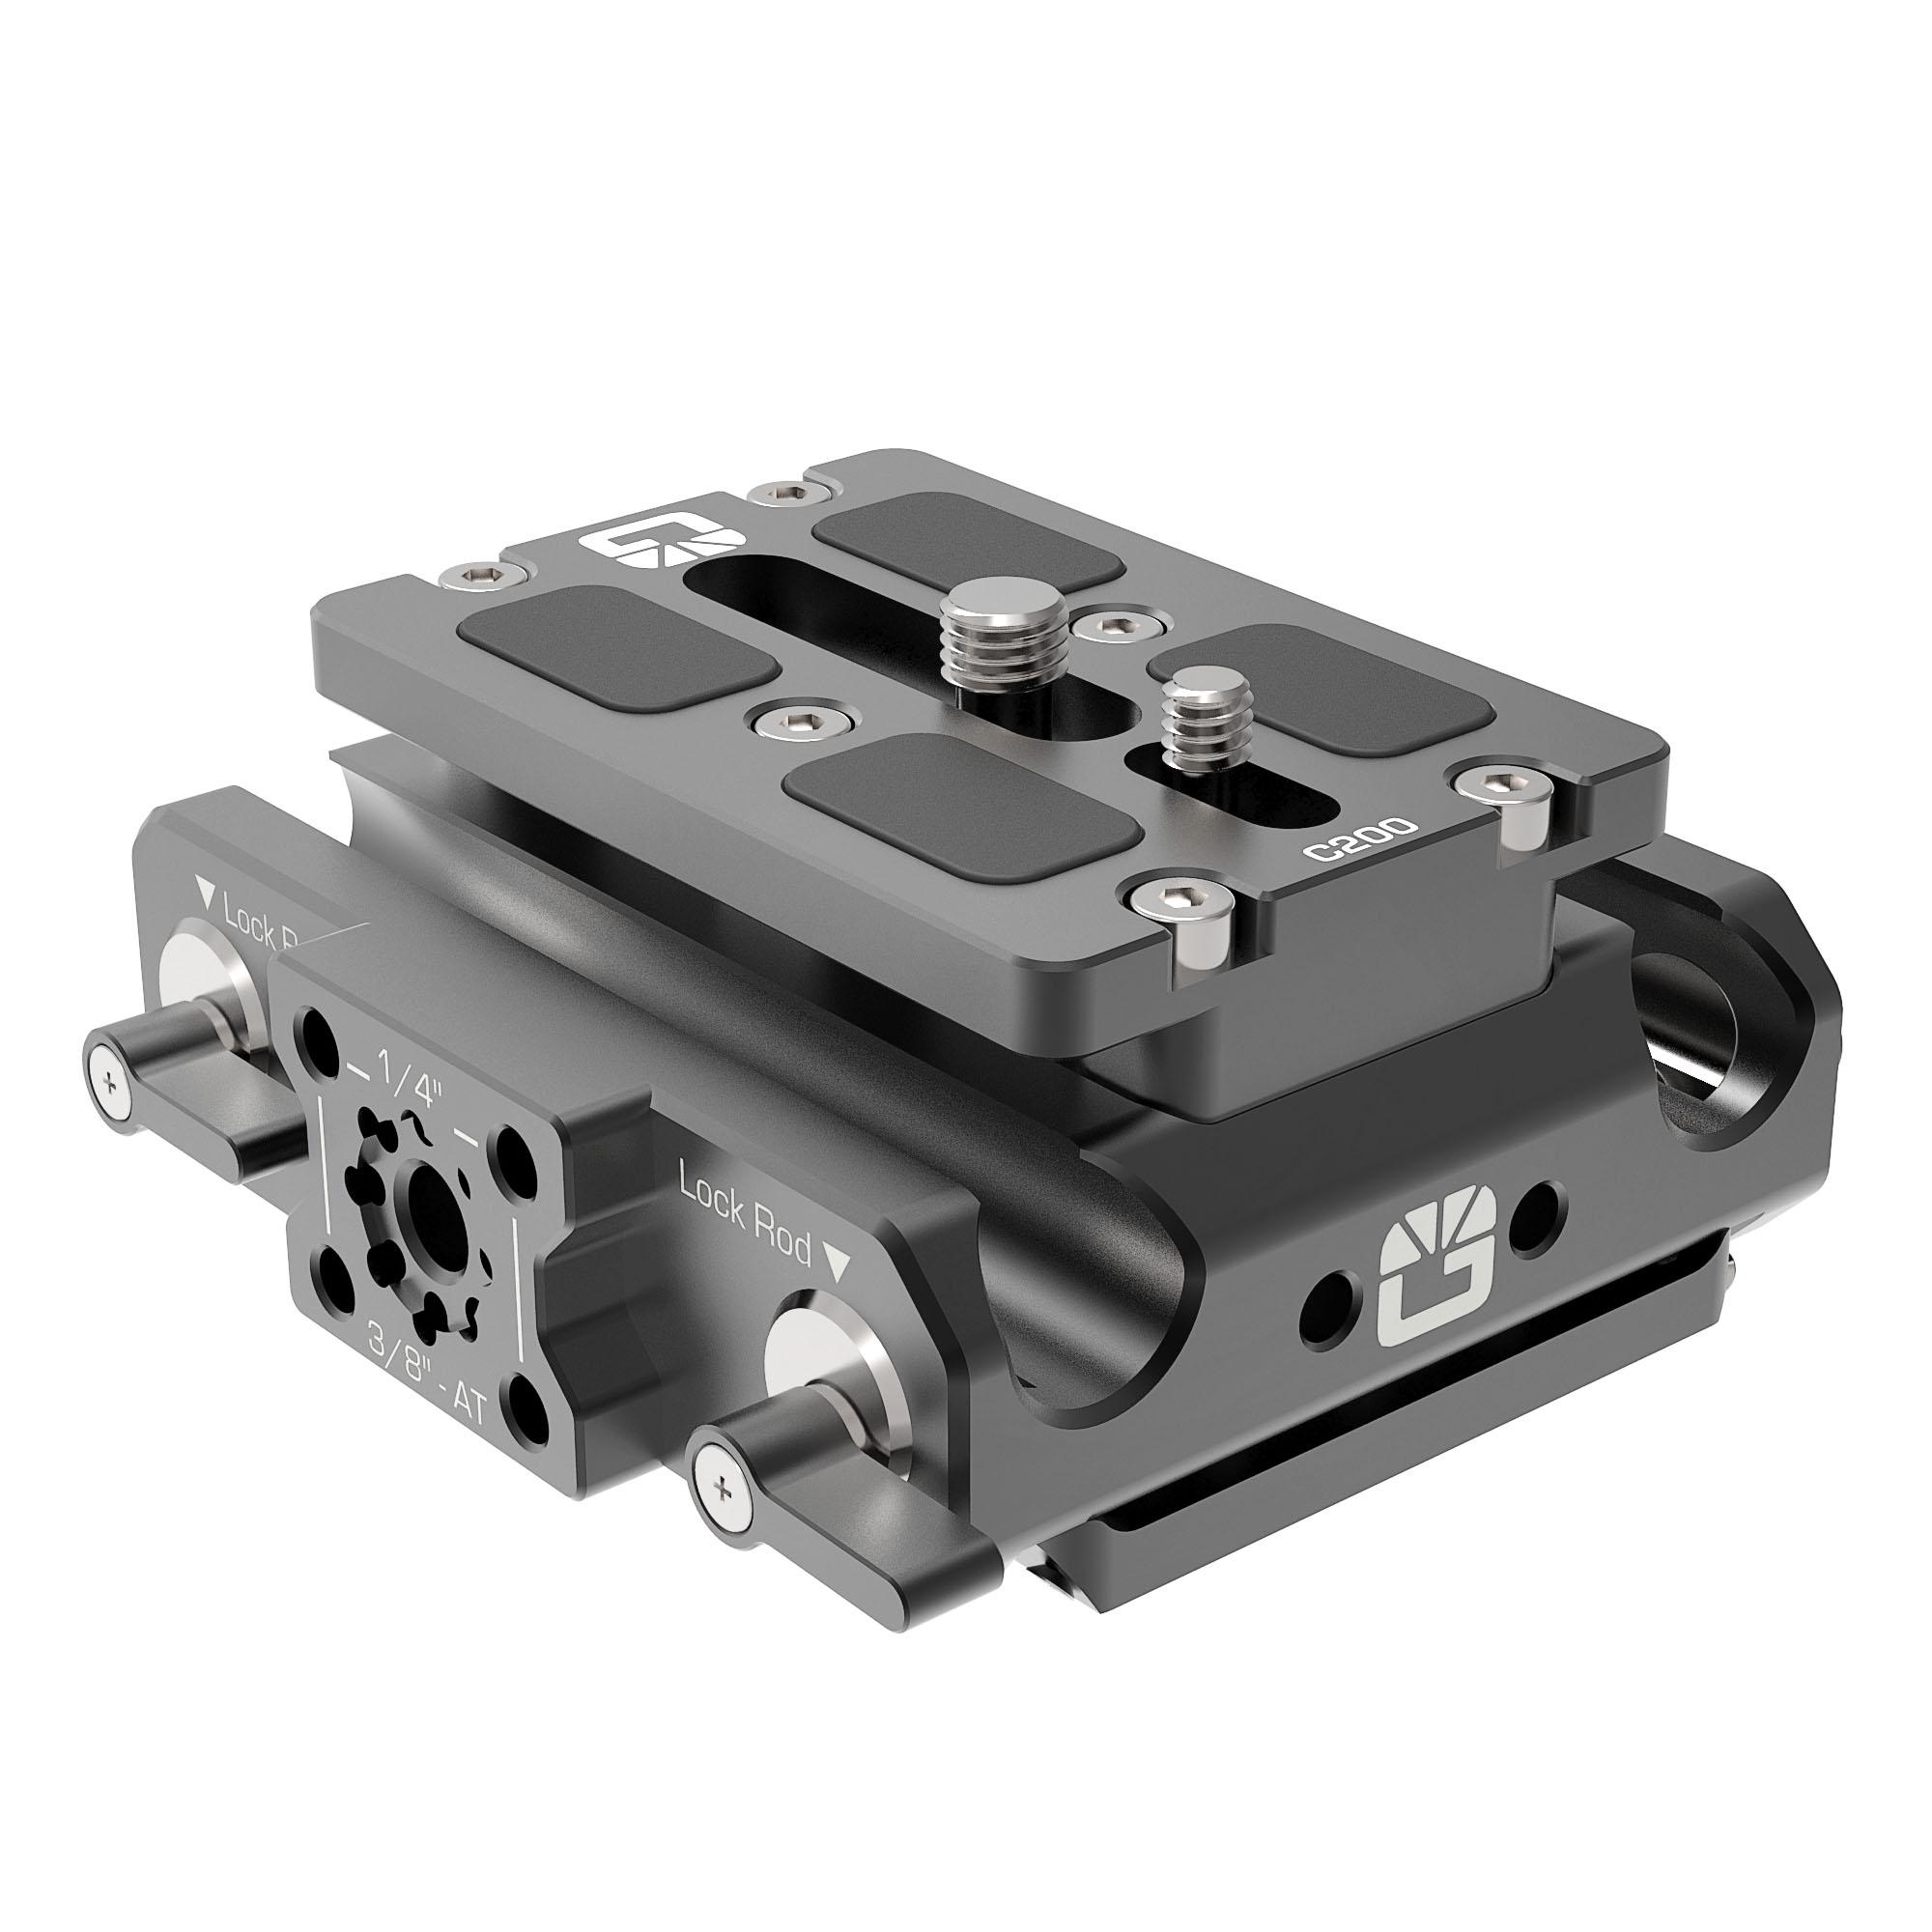 B4005.0001 Canon C200 LWS sliding Baseplate 2 1